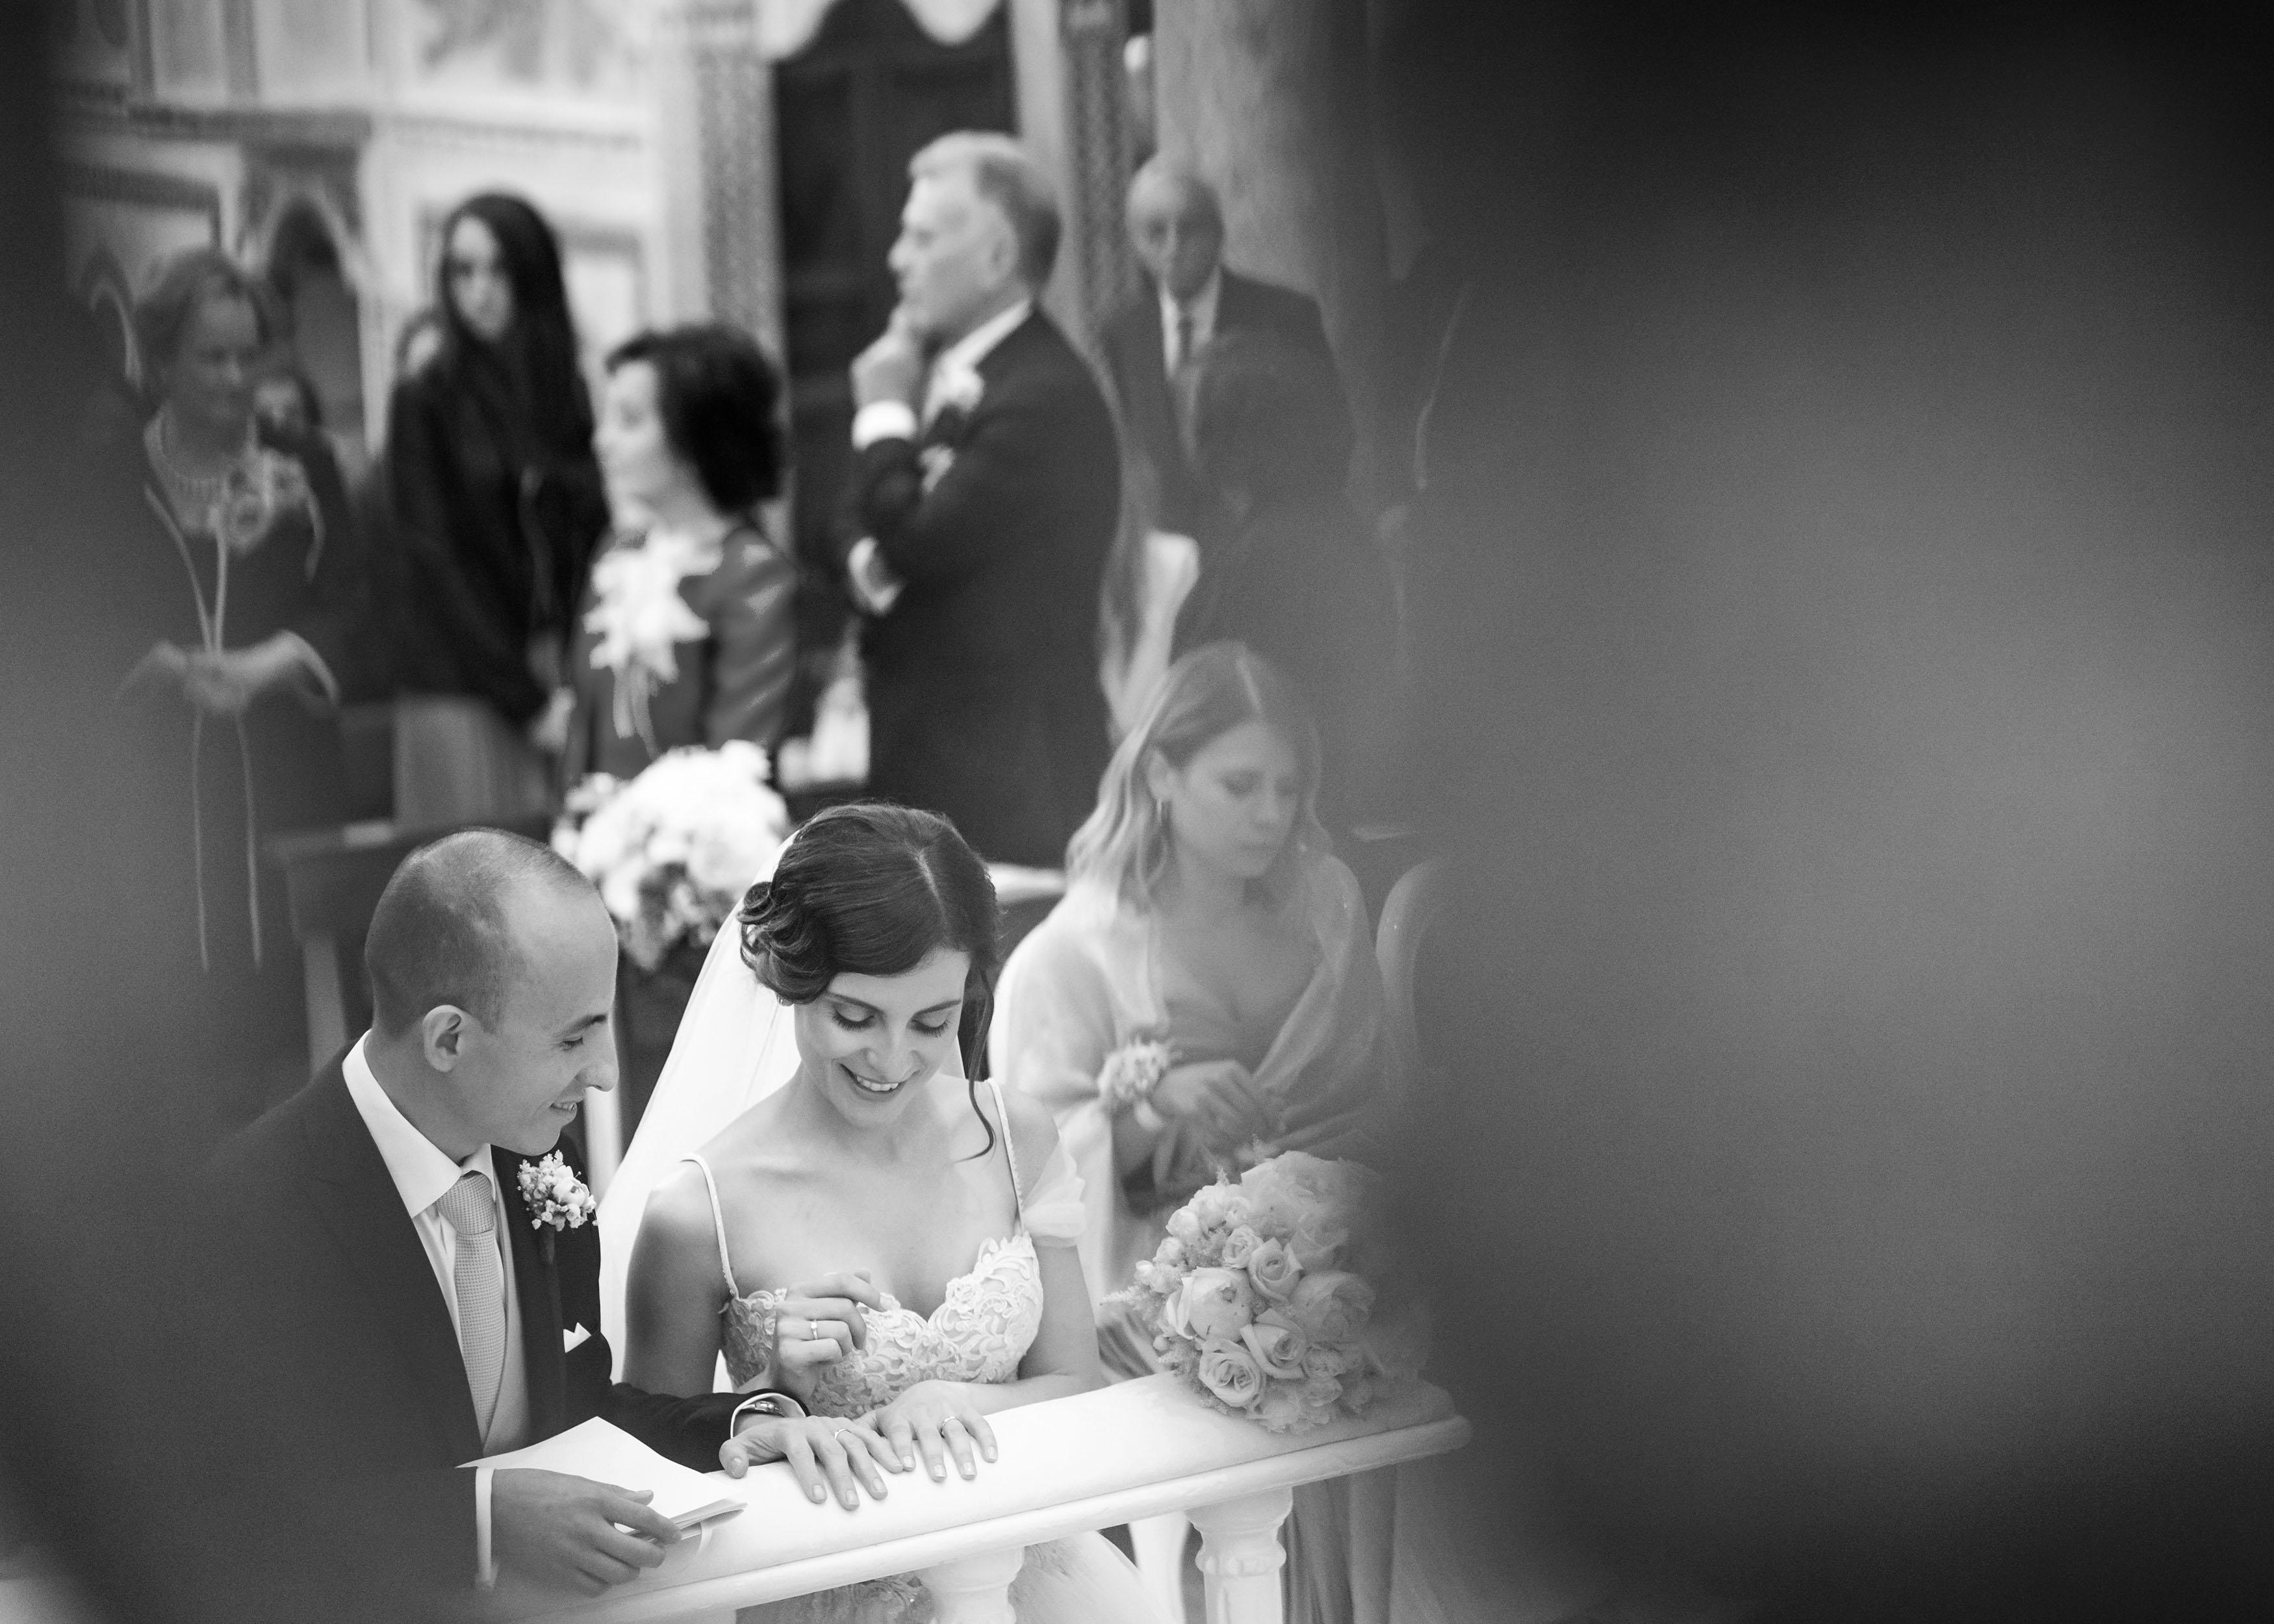 http://www.weddingamalfi.com/wp-content/uploads/Katia-Jorge-18-maggio-2019-27.jpg